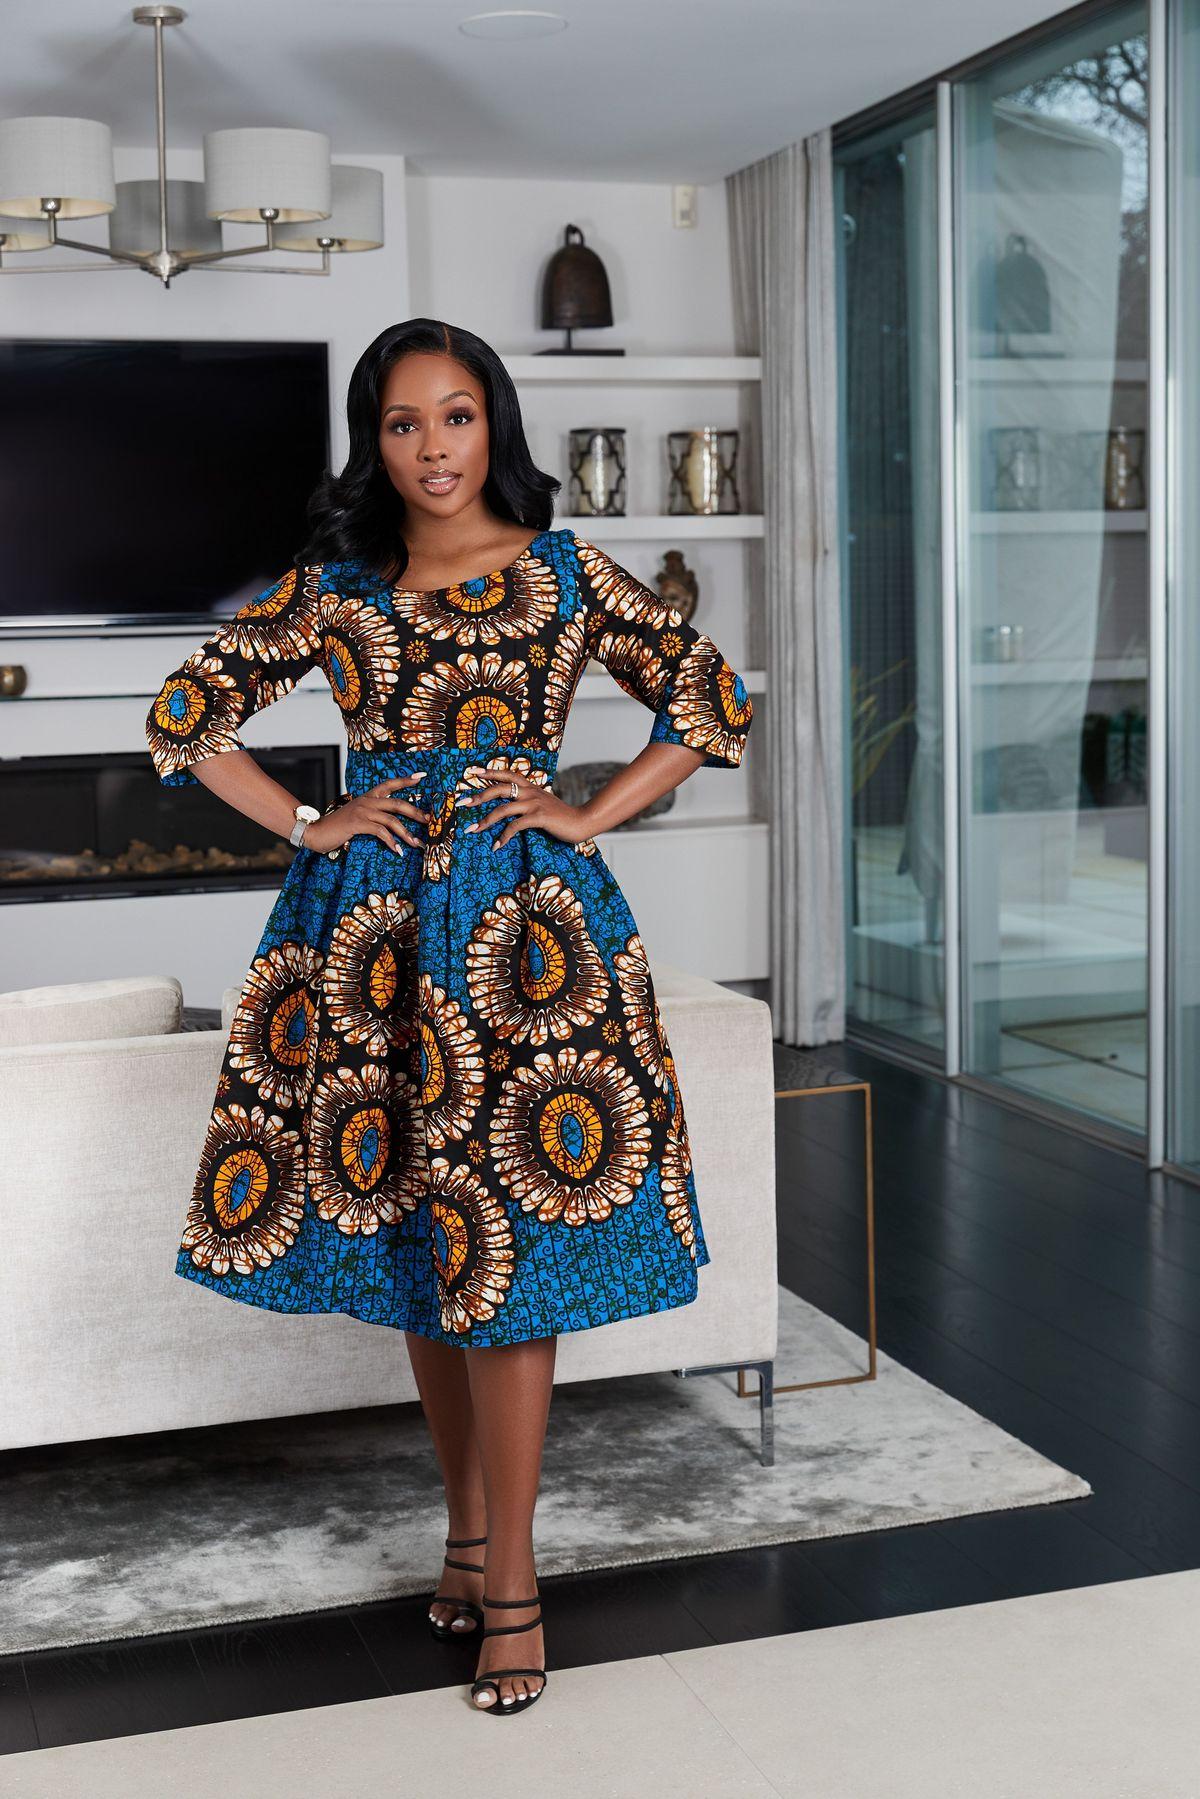 Ankara Dress|African Clothing|African Print Dress|African Fabric|Ankara Clothing|Black Panther Costume|Dashiki Dress|Dashiki Dress|Headwrap